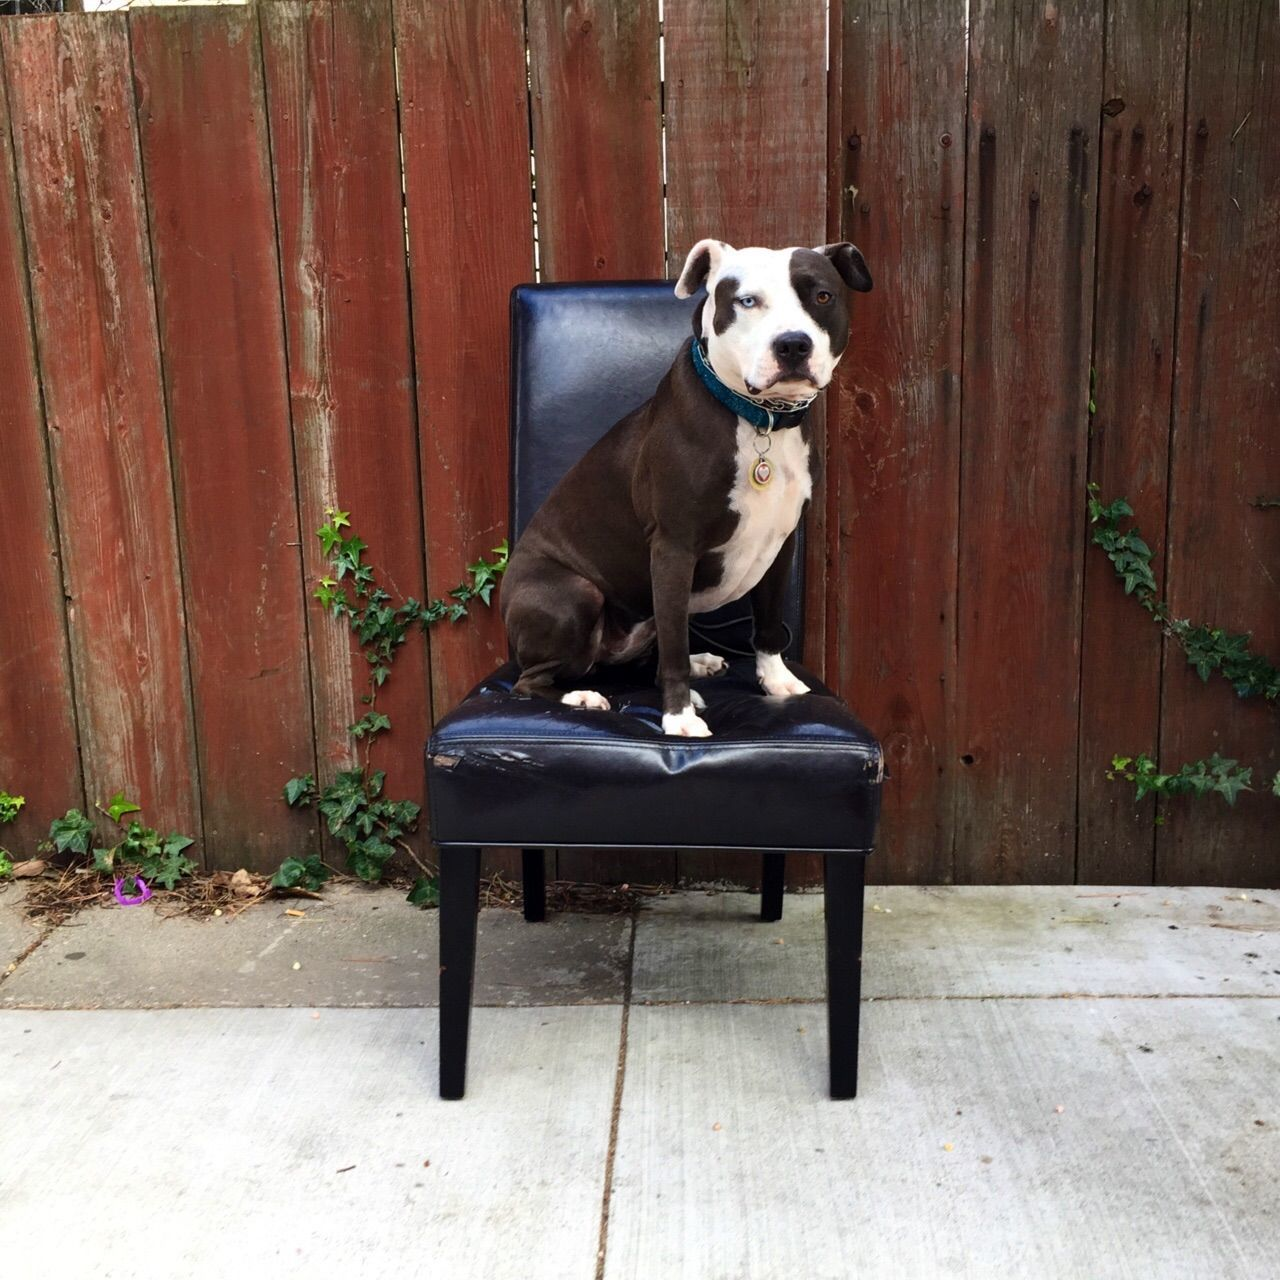 Pets Corner Spoon The Dog Chair Staffy Pitbull